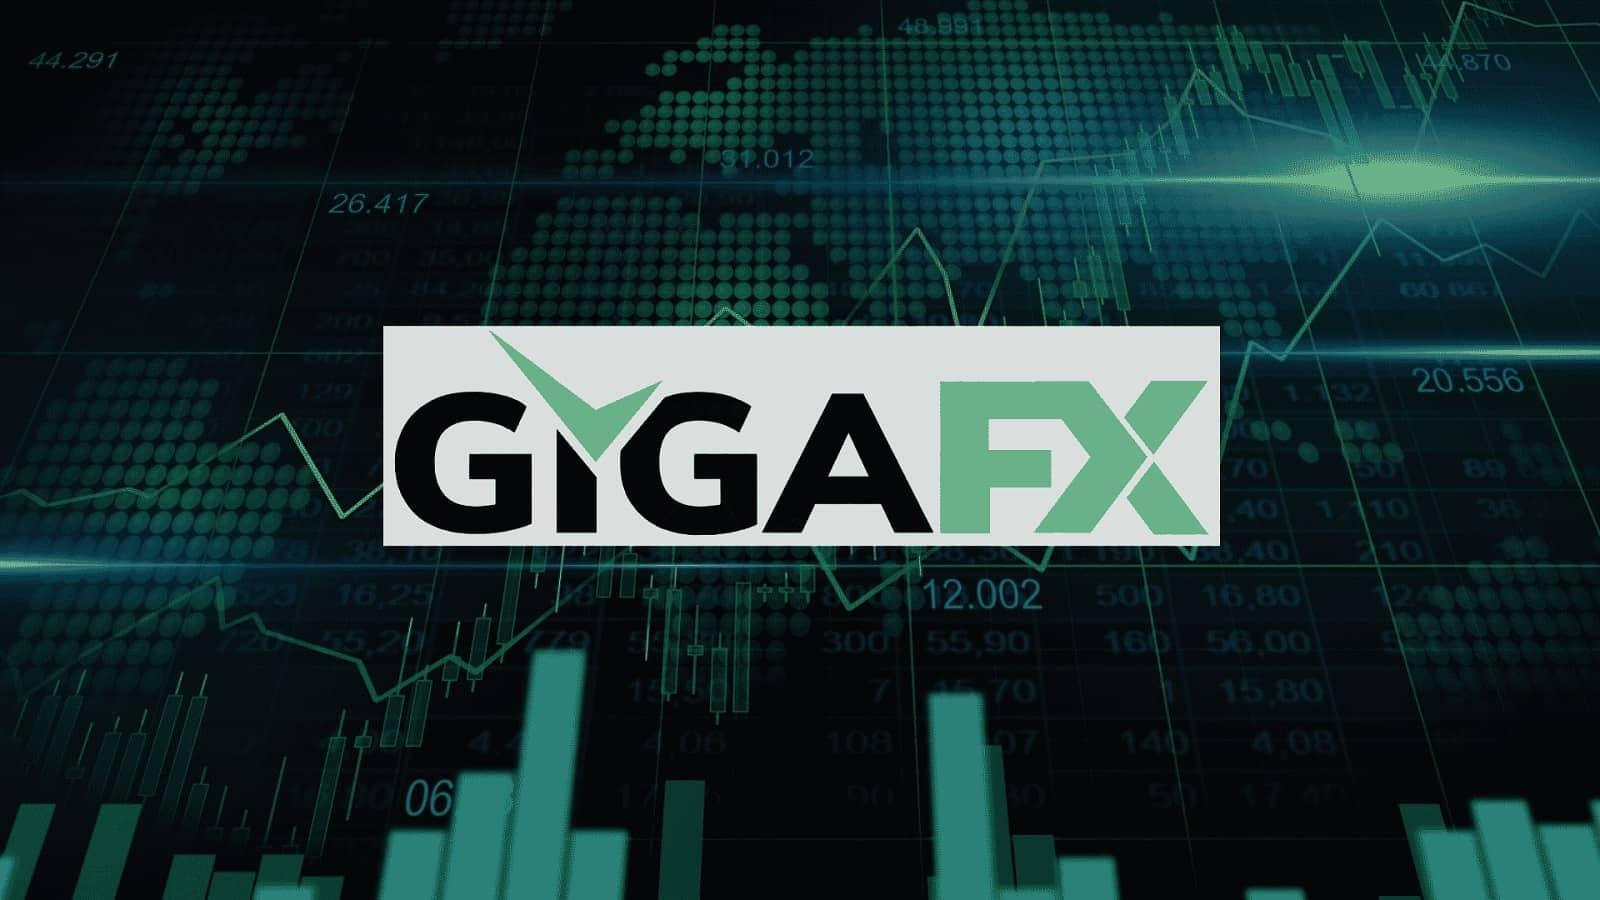 GigaFX- The best trading platform for beginners